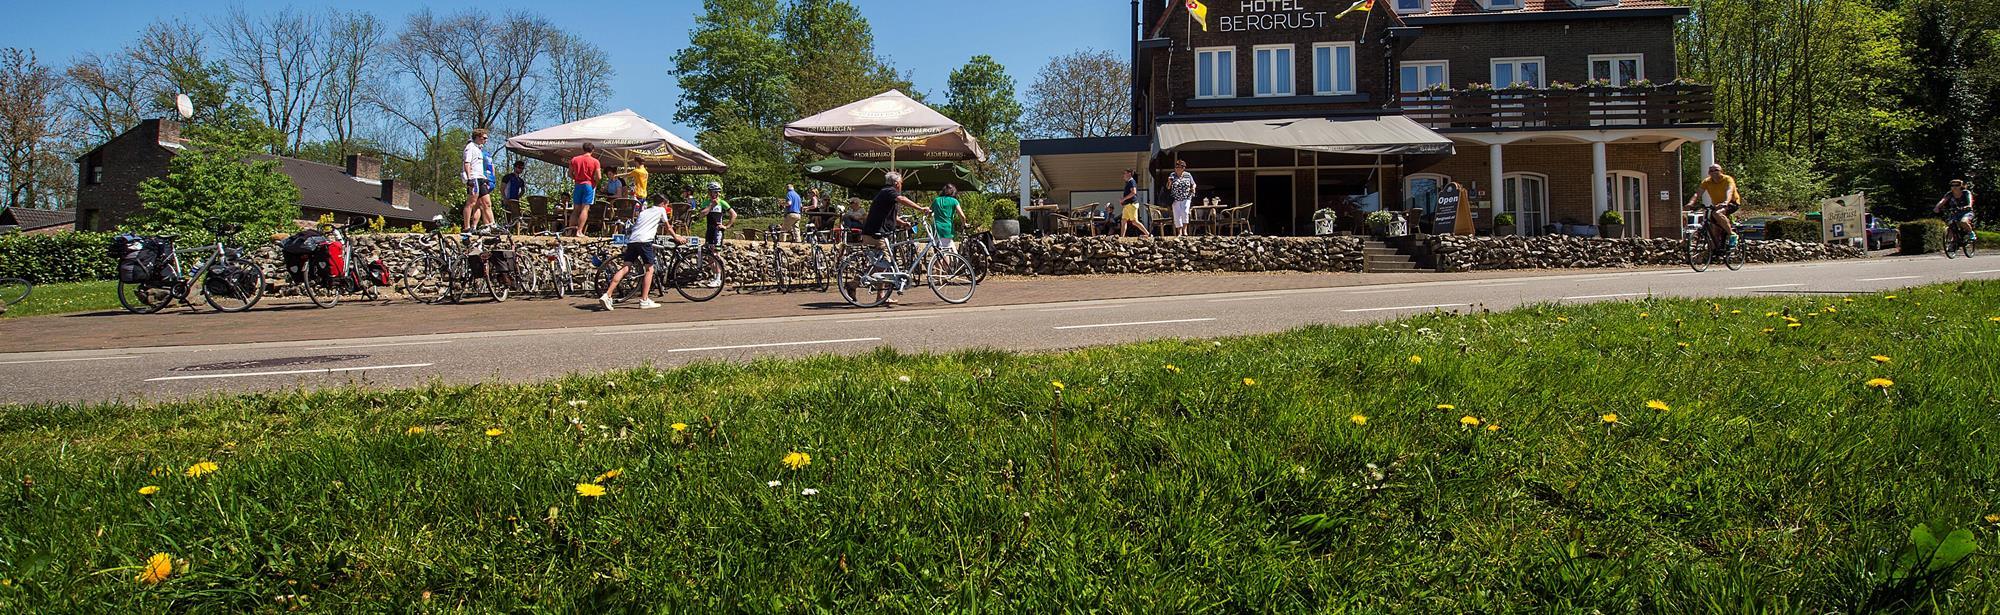 Hotel Bergrust